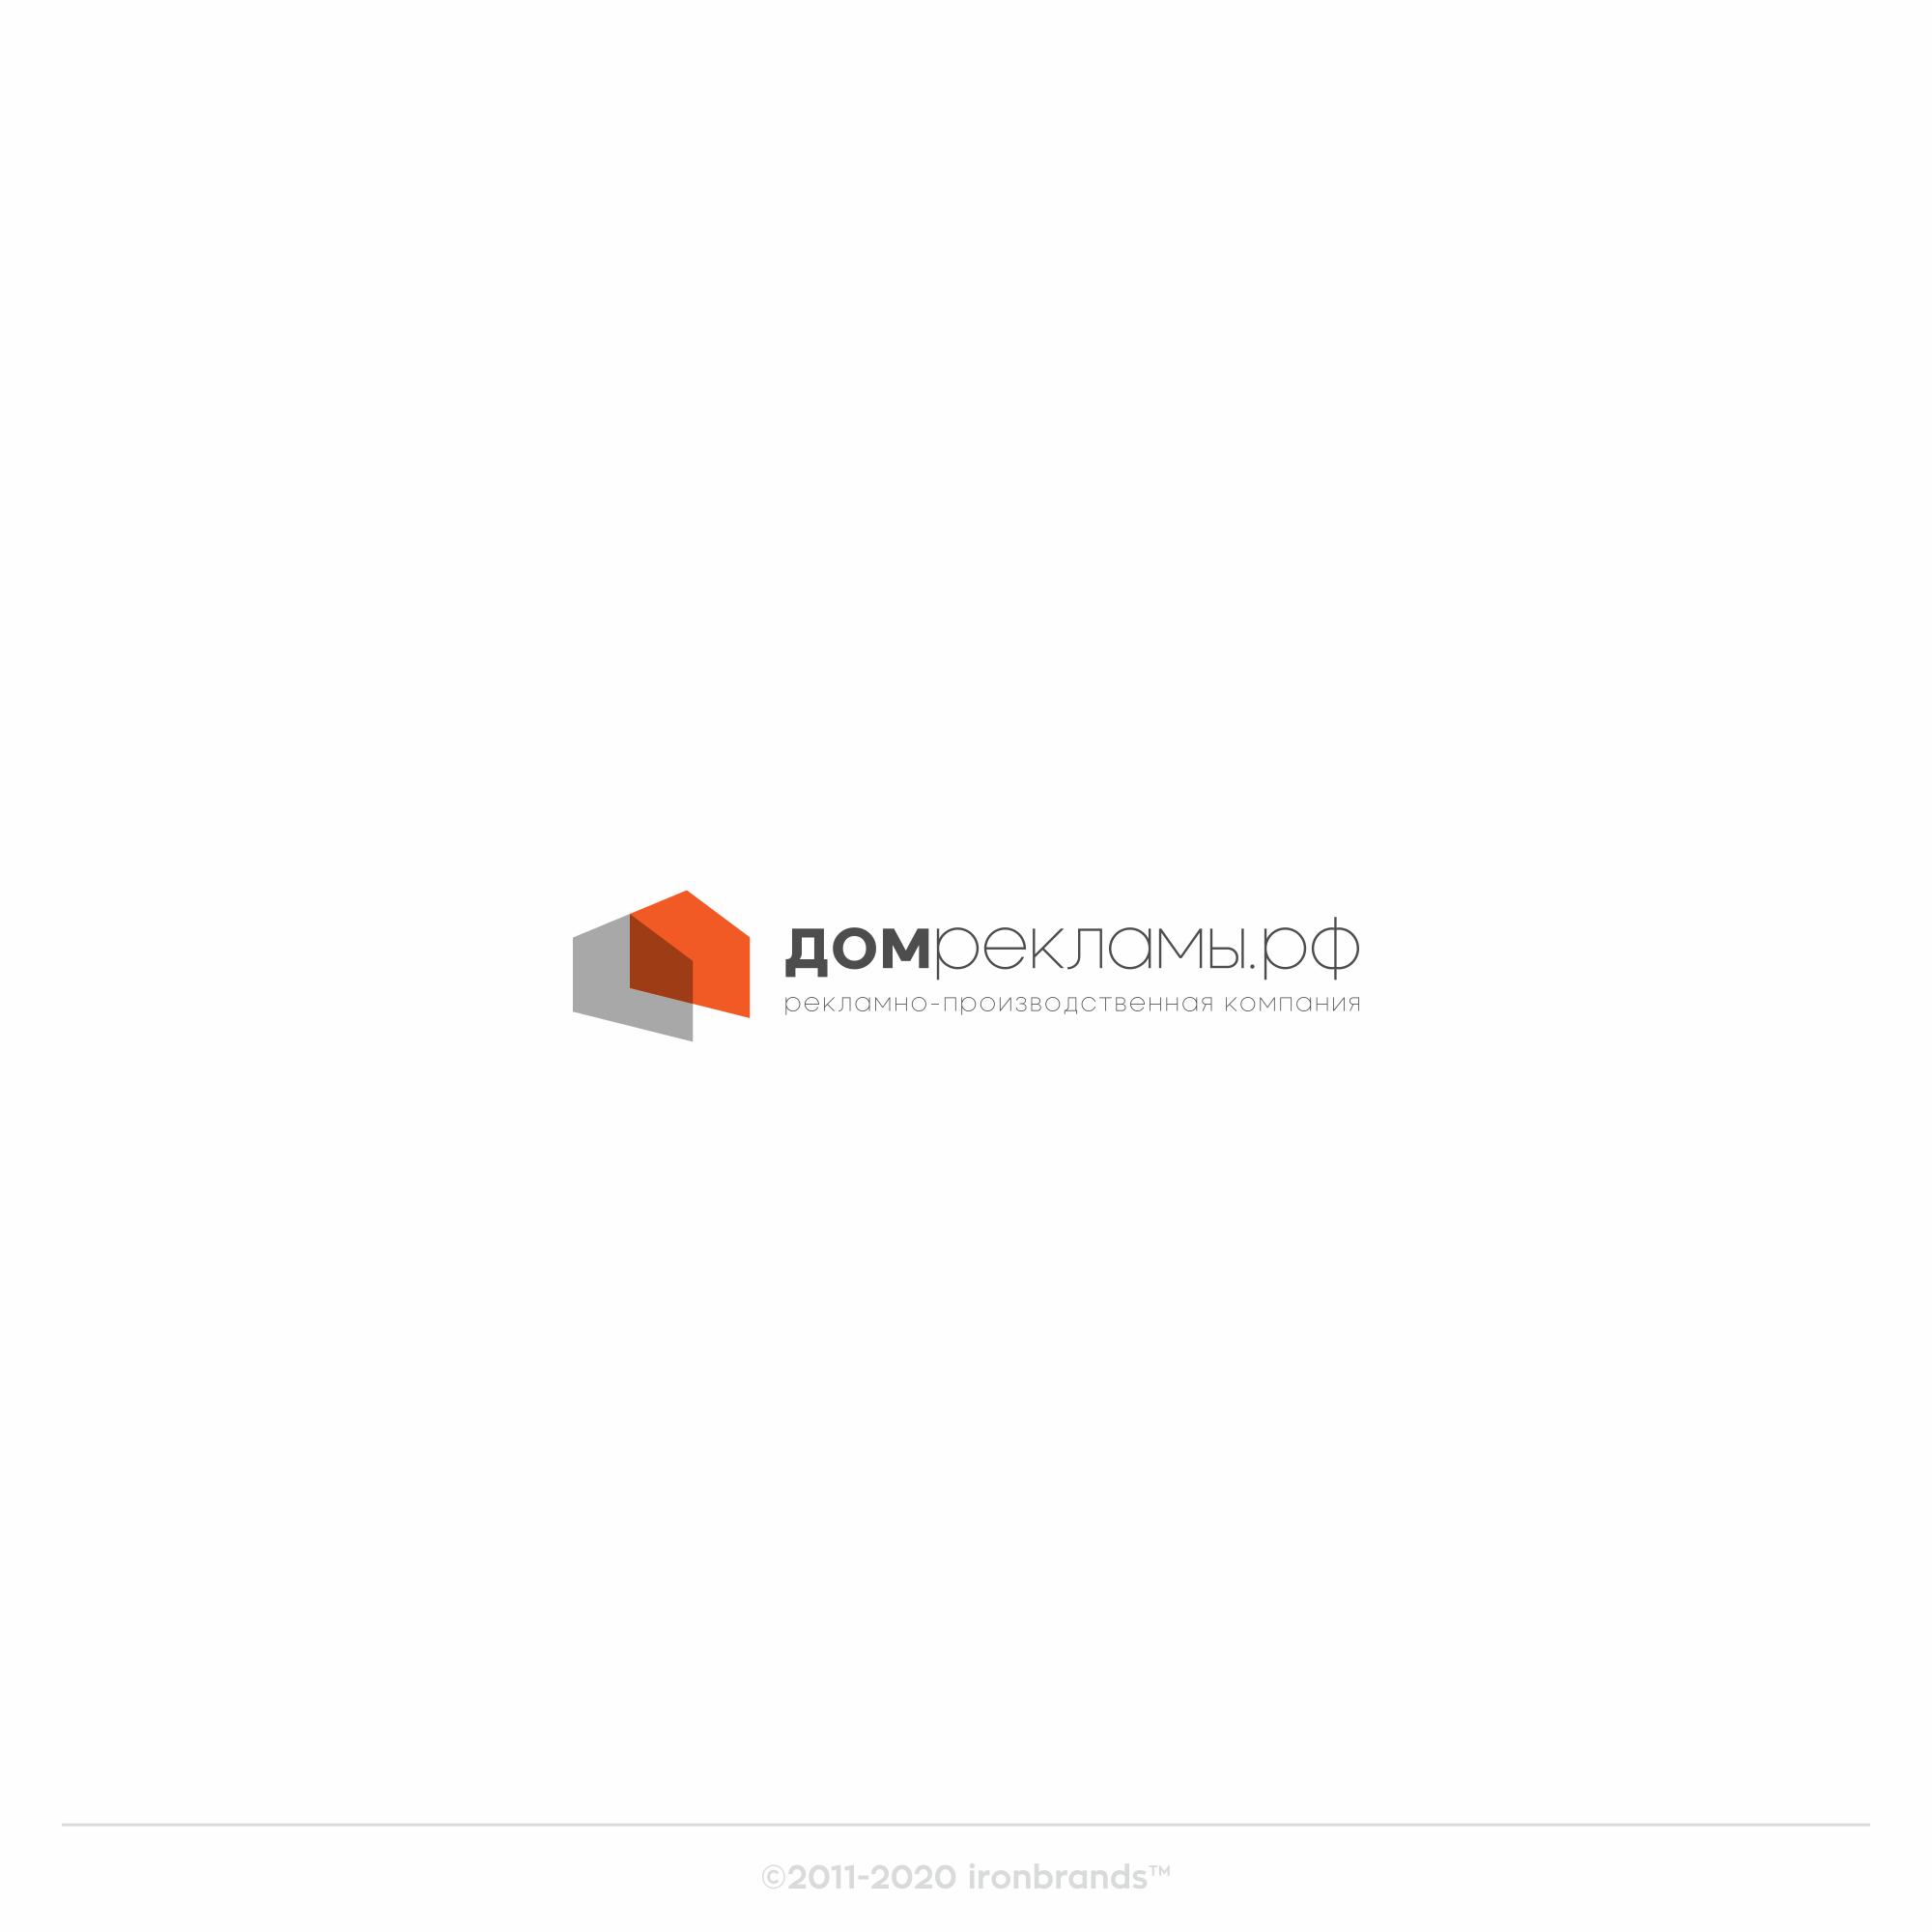 Дизайн логотипа рекламно-производственной компании фото f_8245ee09f668e786.jpg